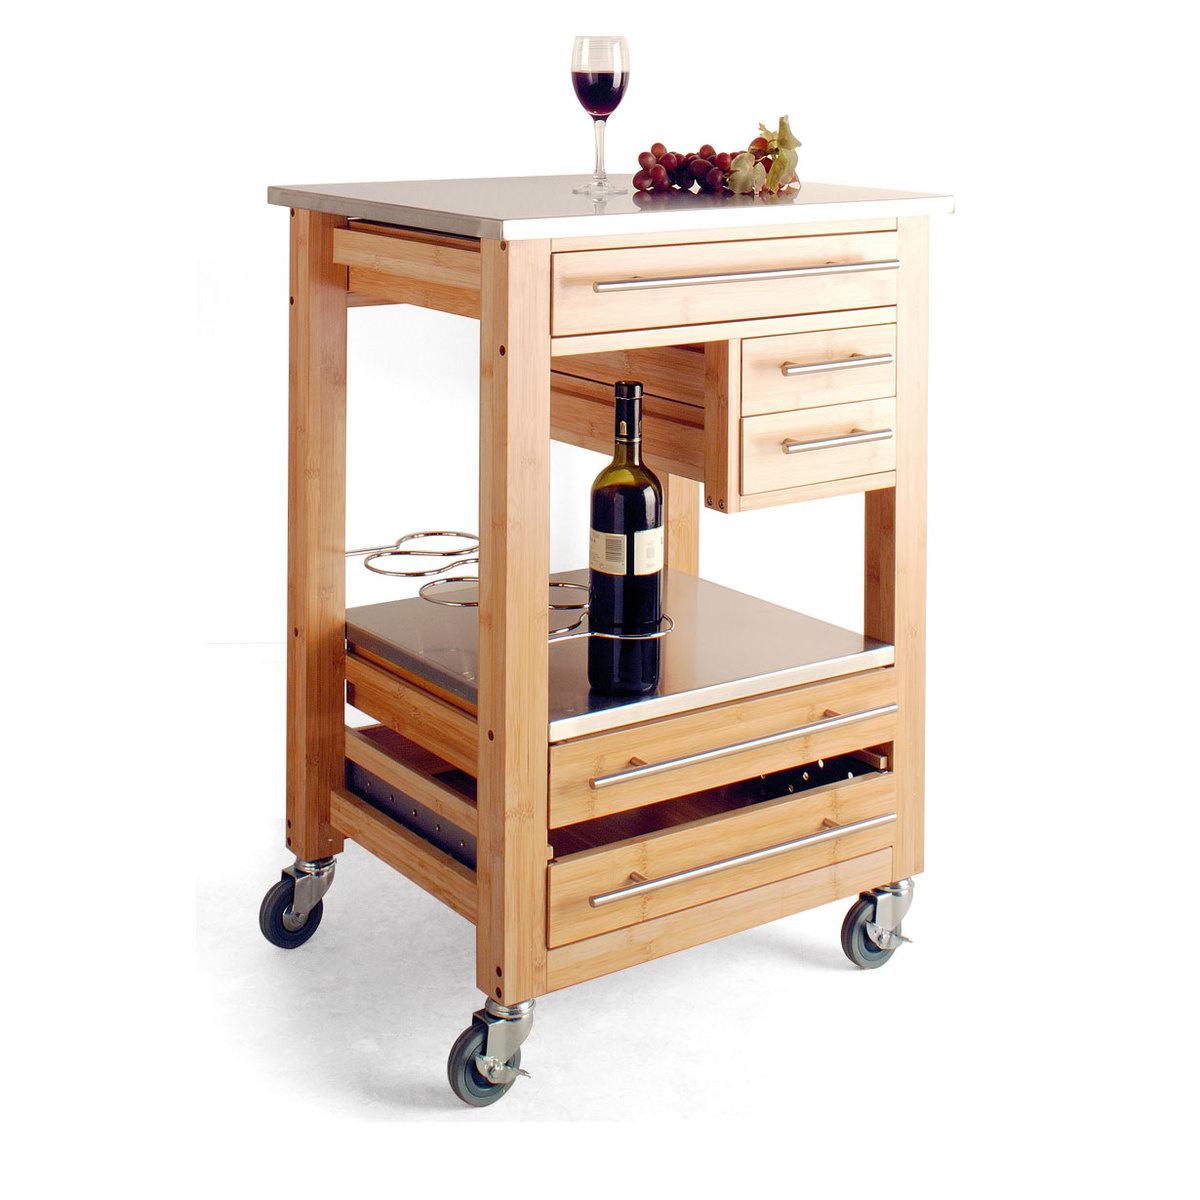 Mobile carrello e portabottiglie by brandani lovethesign for Mobile porta bottiglie